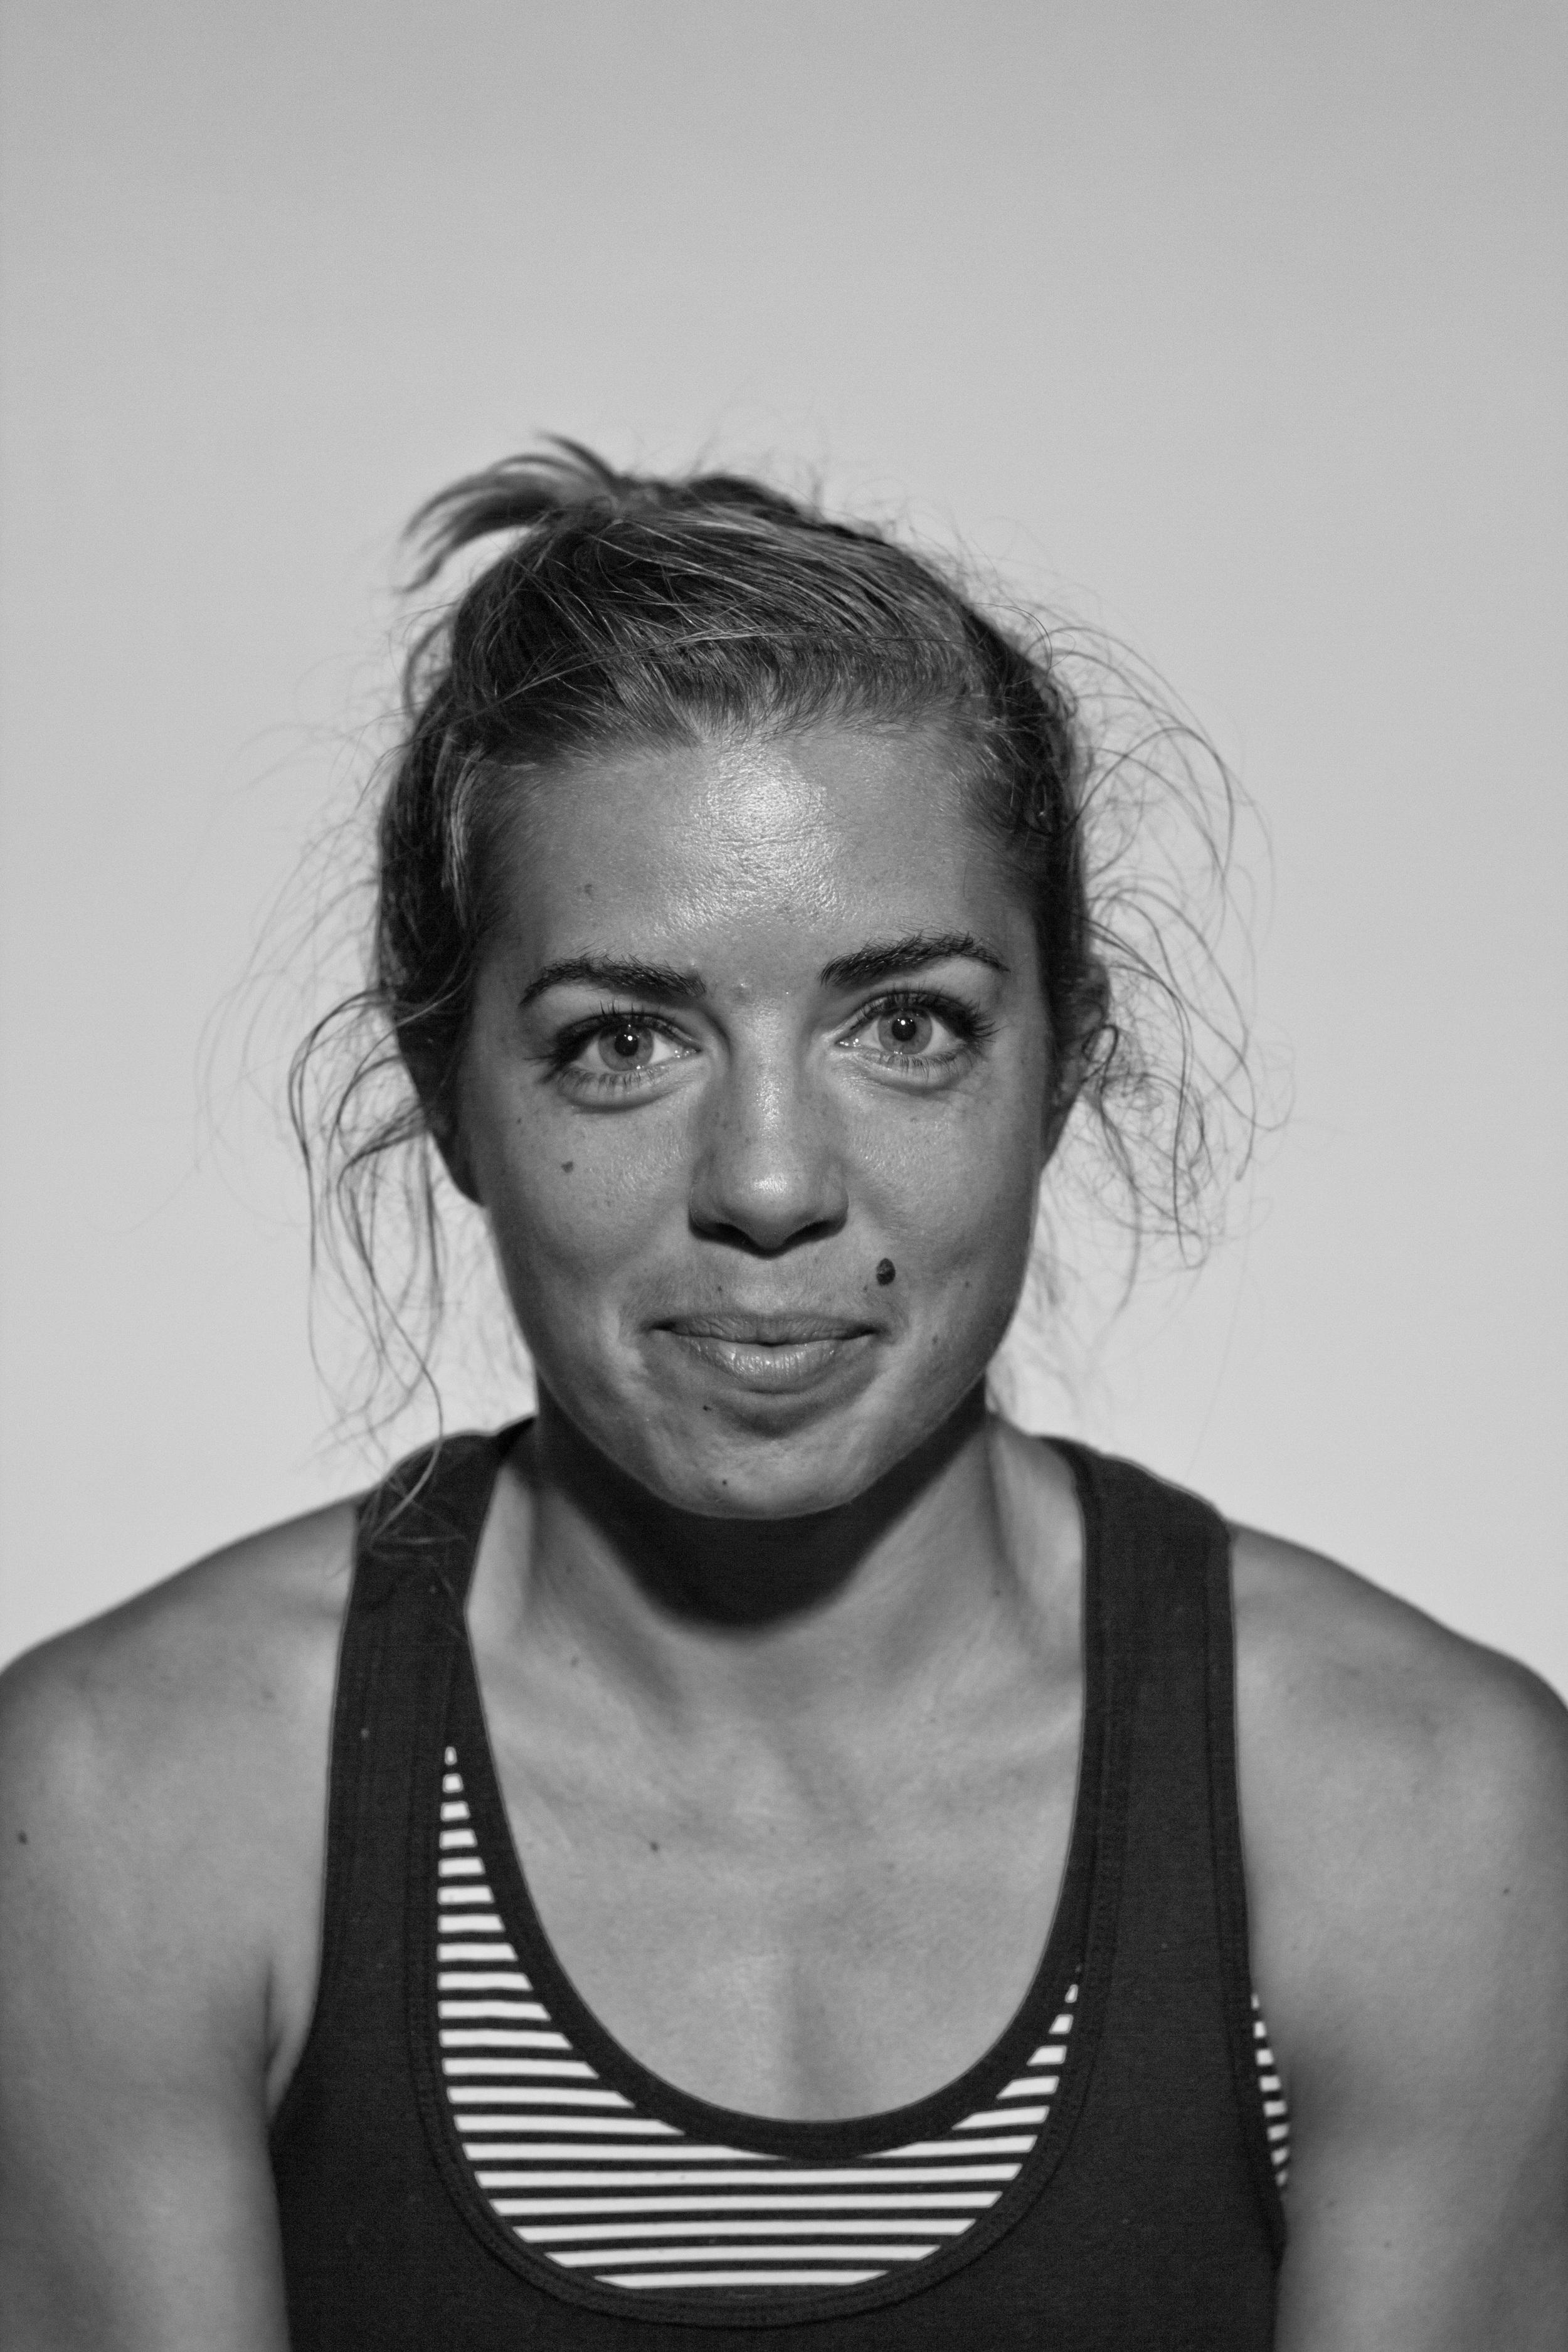 Jessica McGrindle